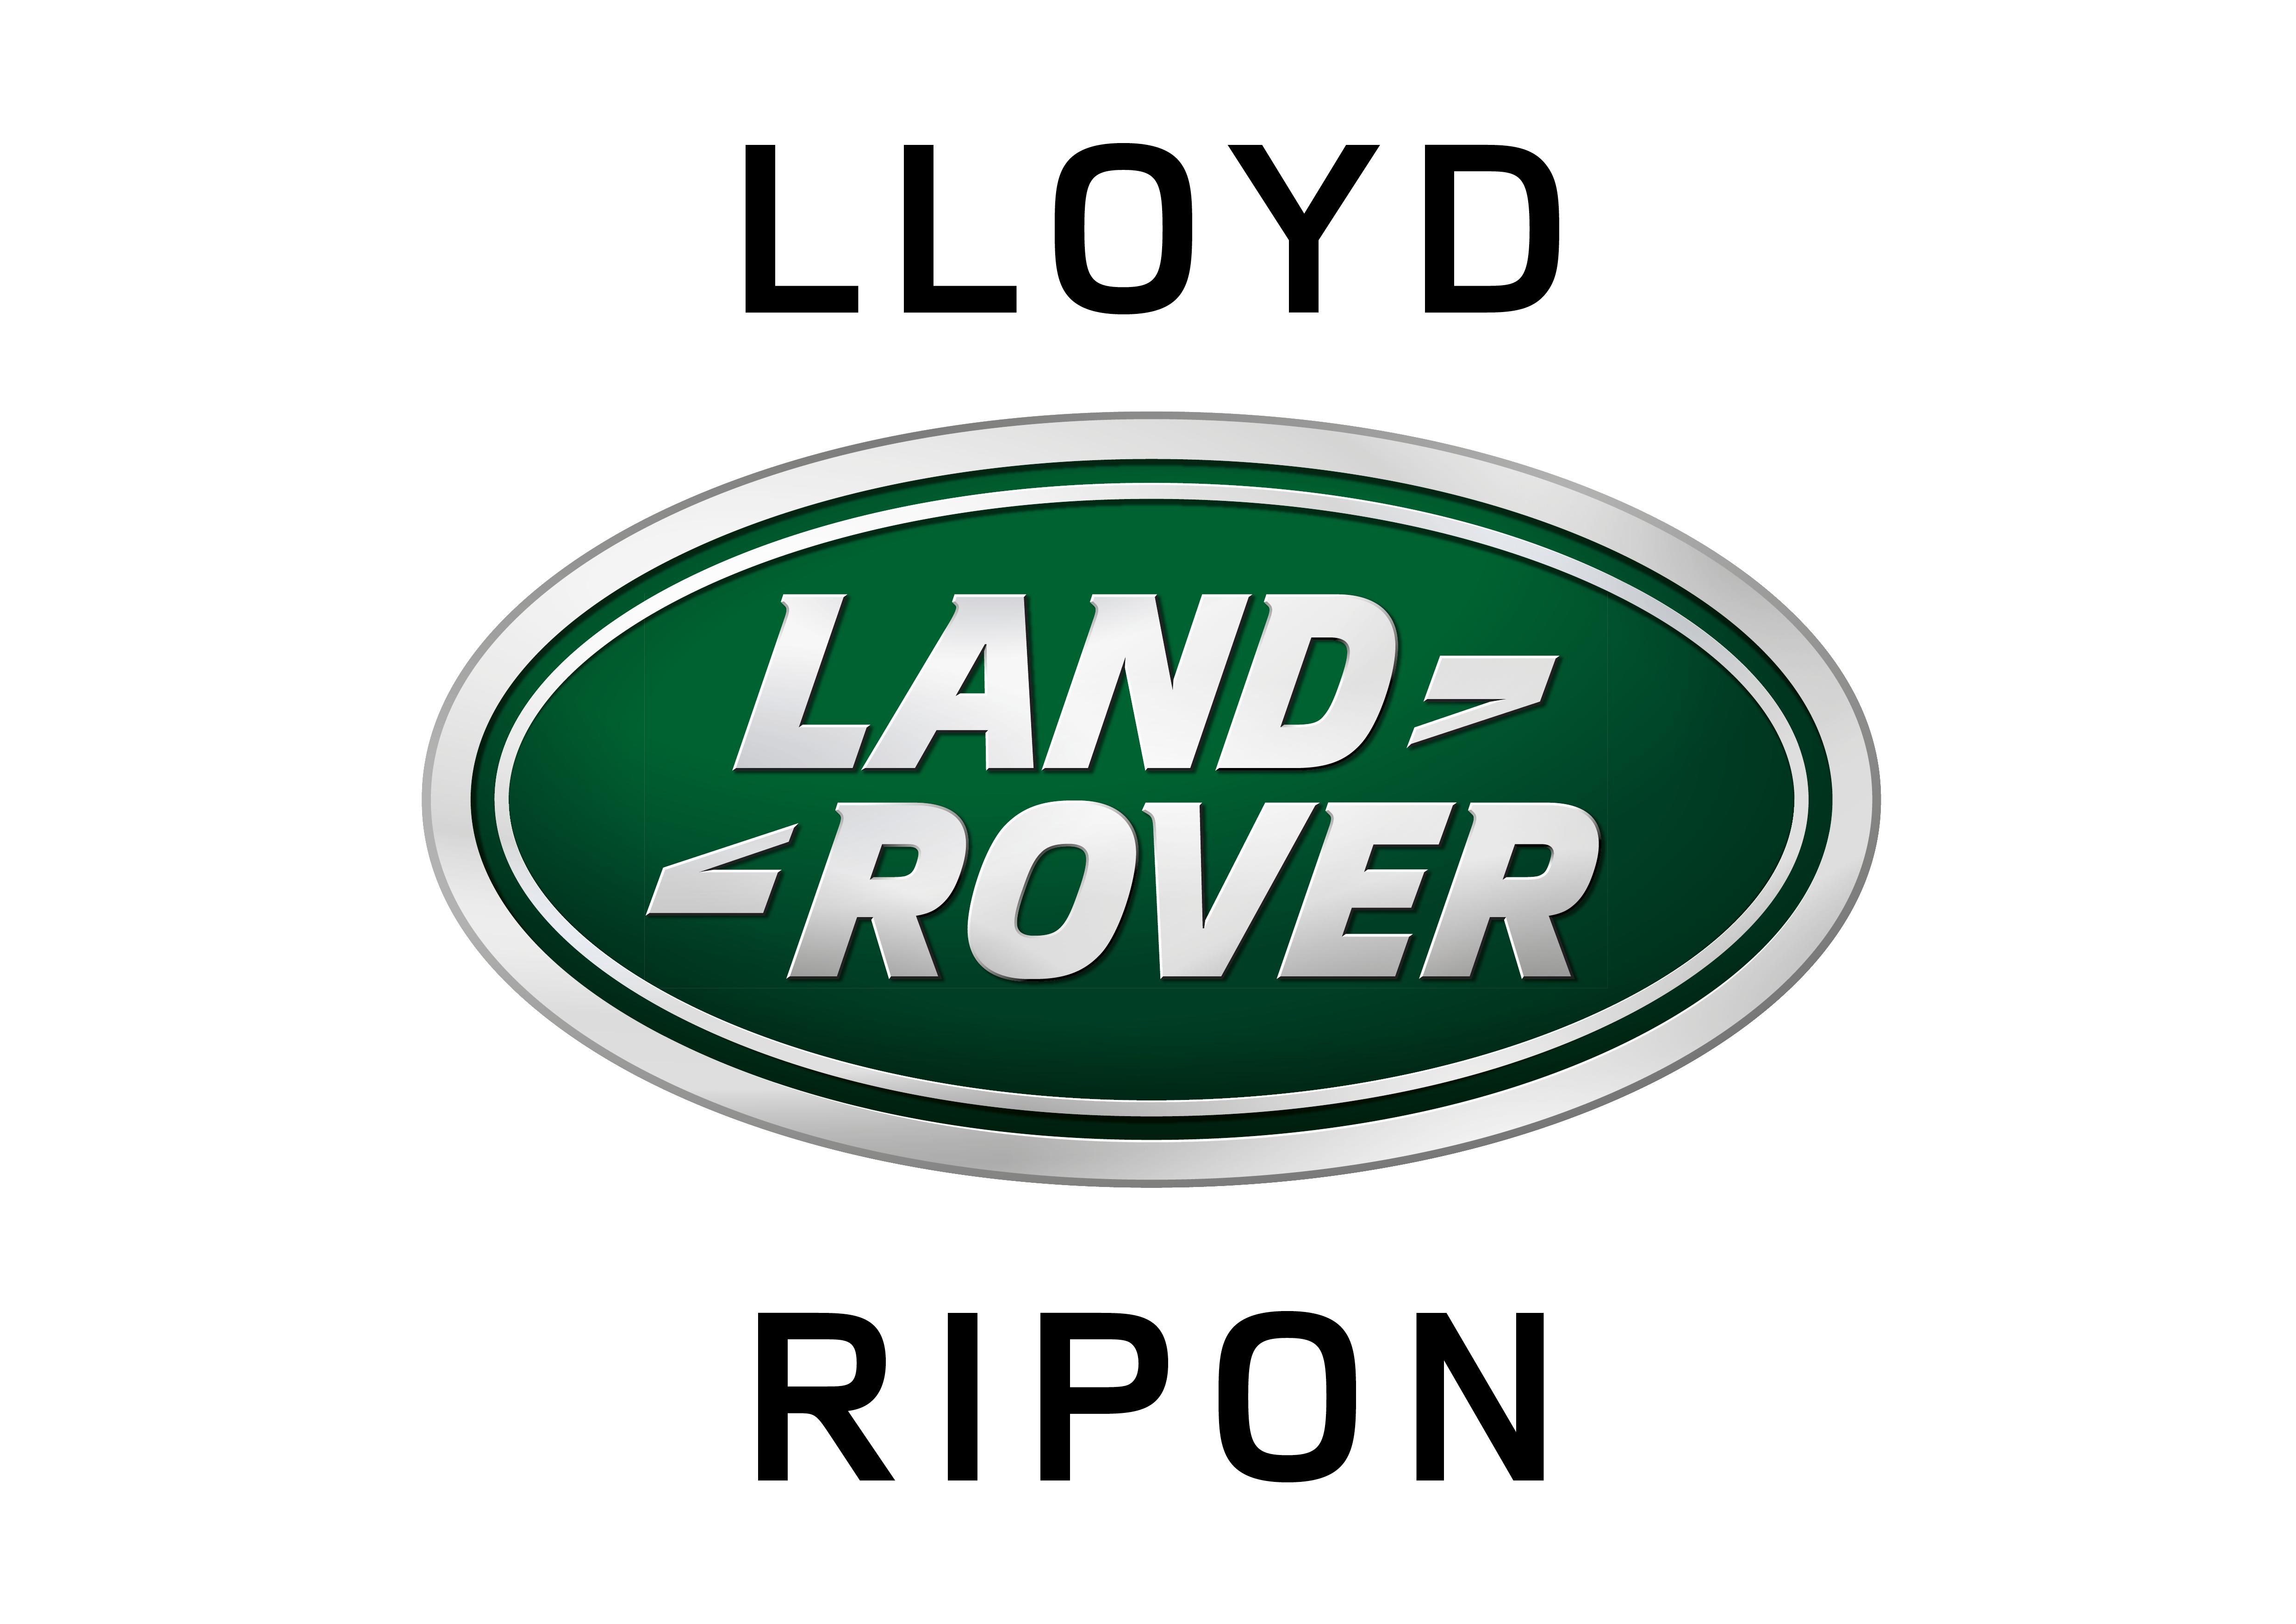 Lloyd LR Ripon logo